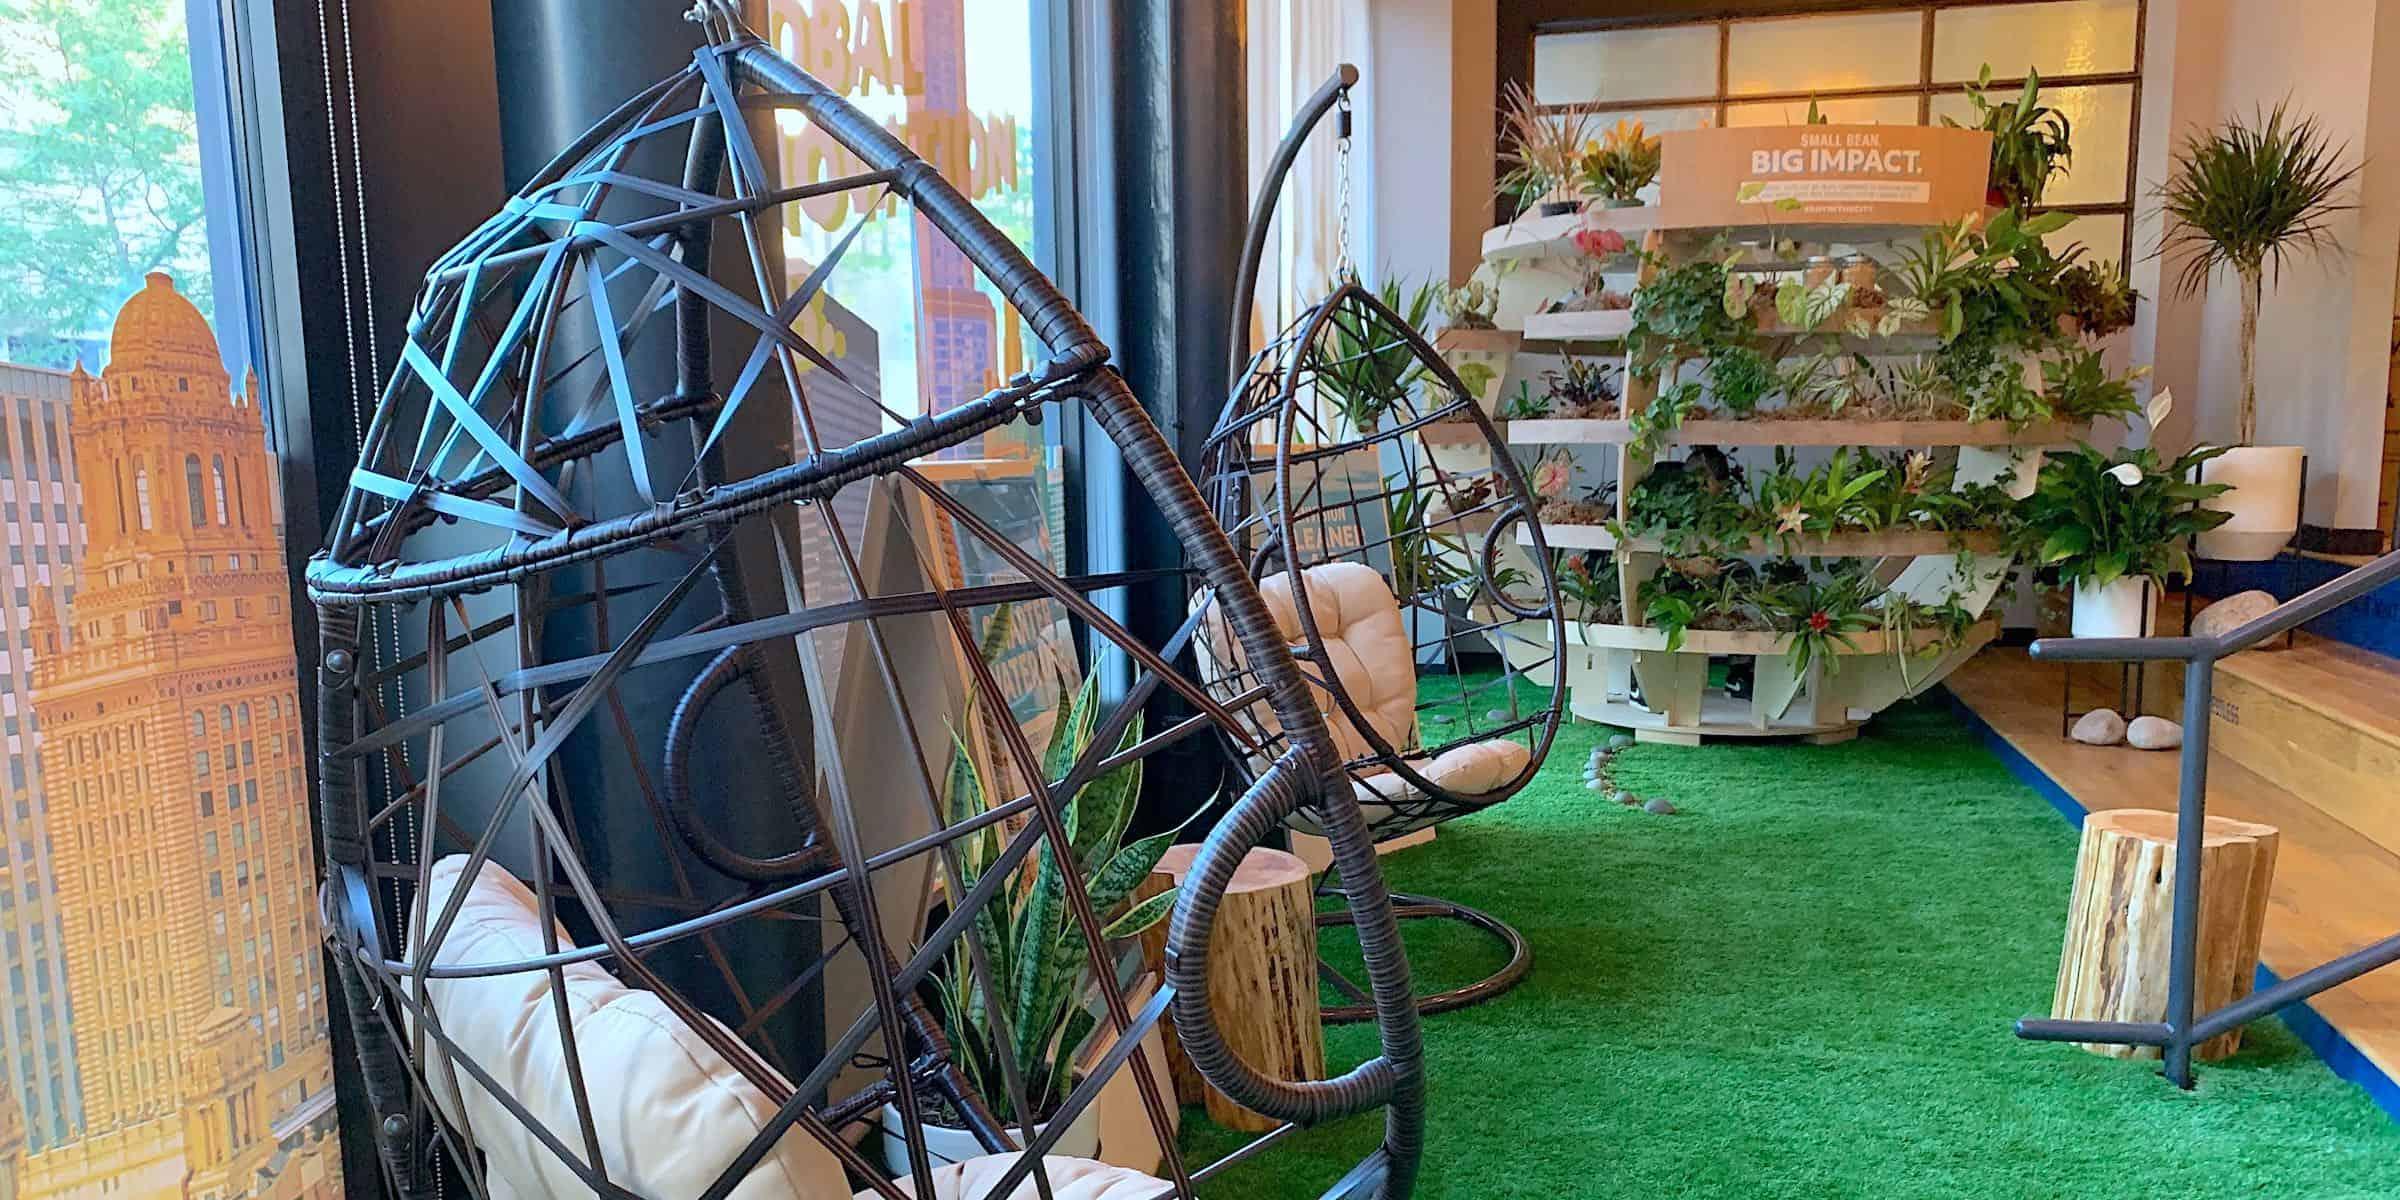 WeWork Lounge Immersive Brand Installation - Chicago, IL